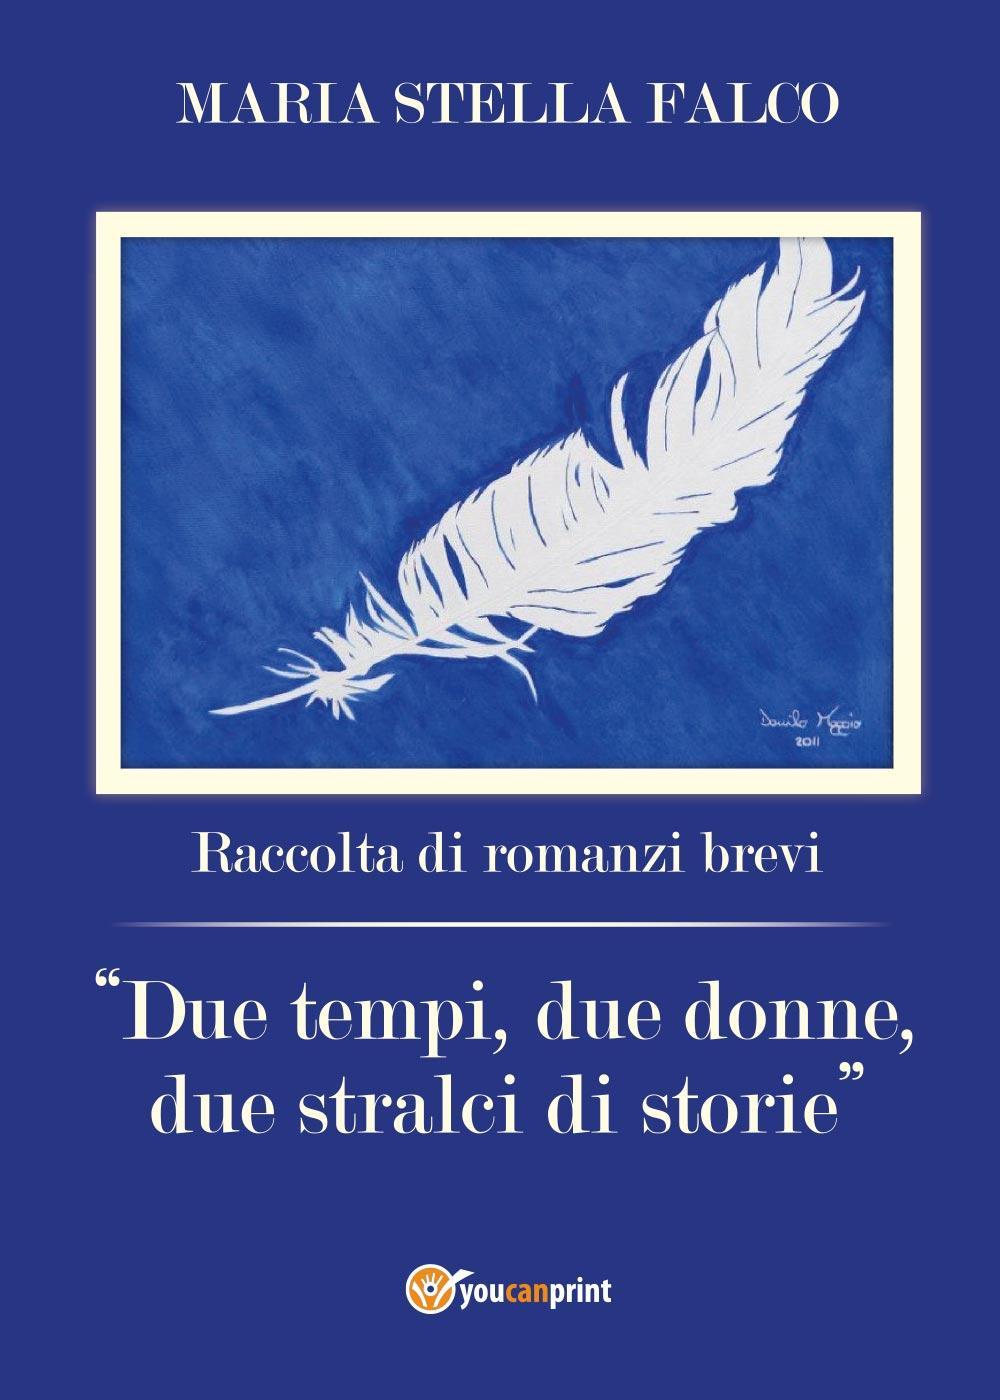 Due tempi, due donne, due stralci di storie